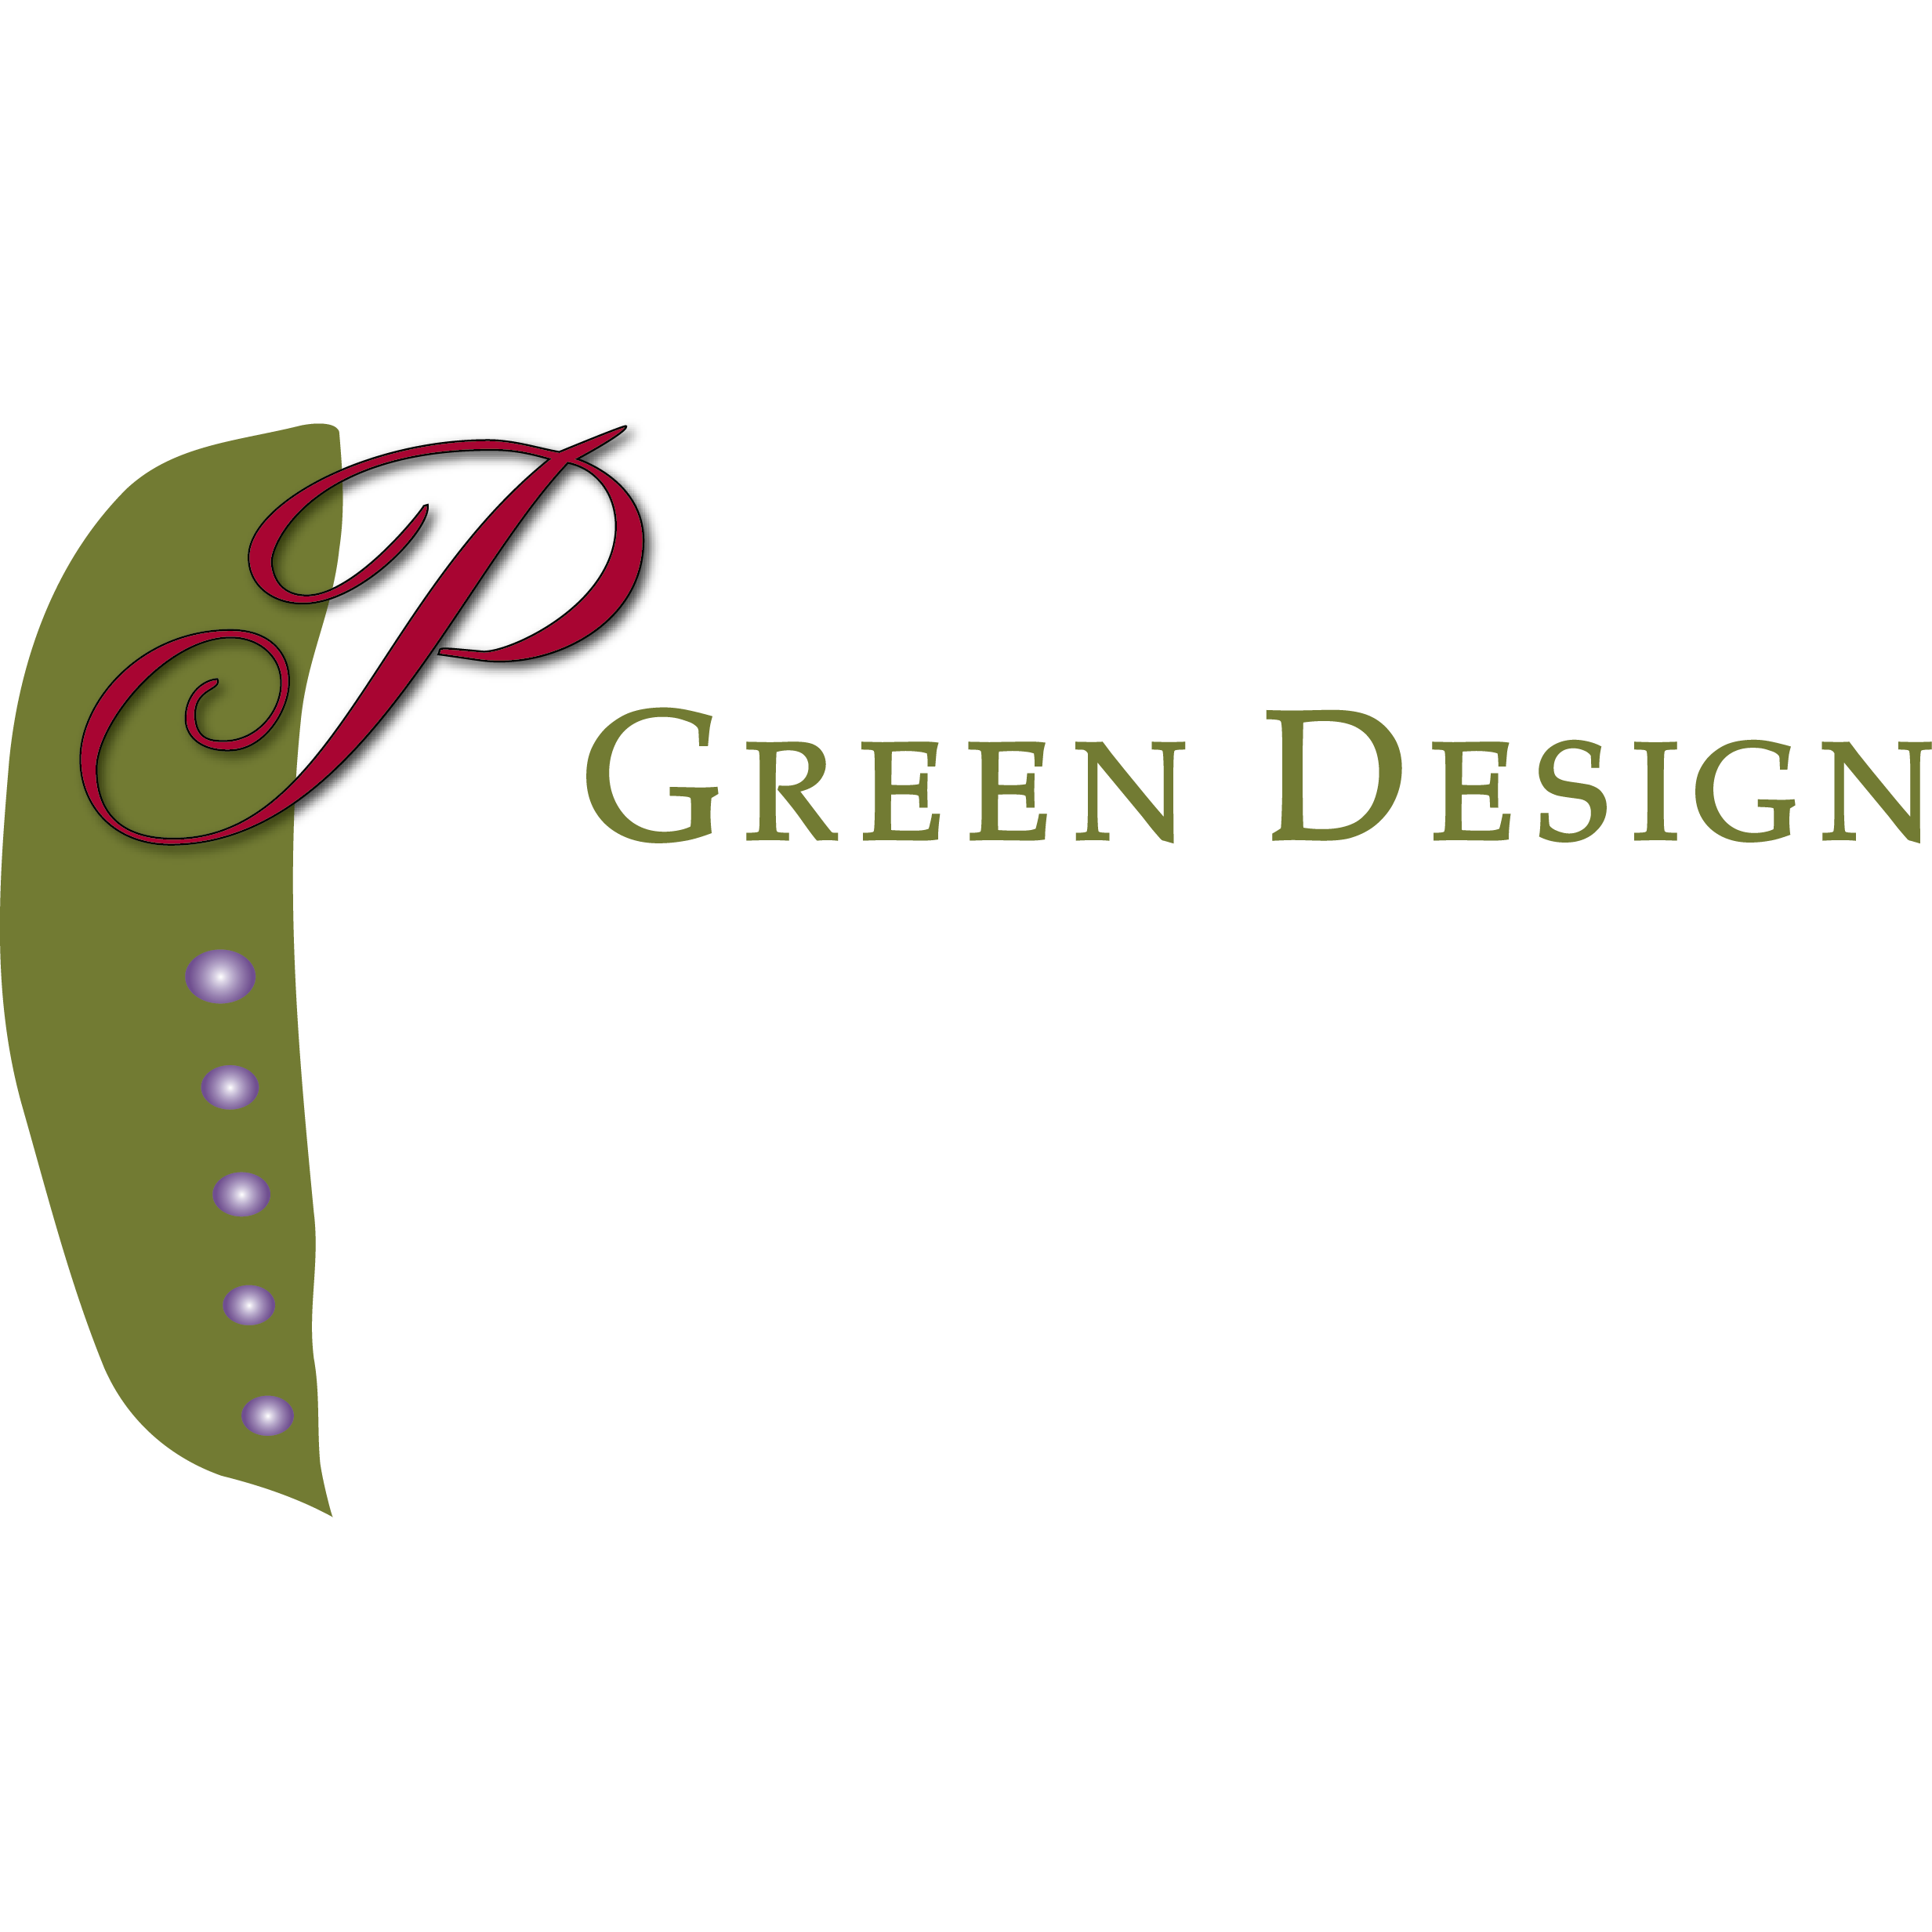 P Green Design image 6